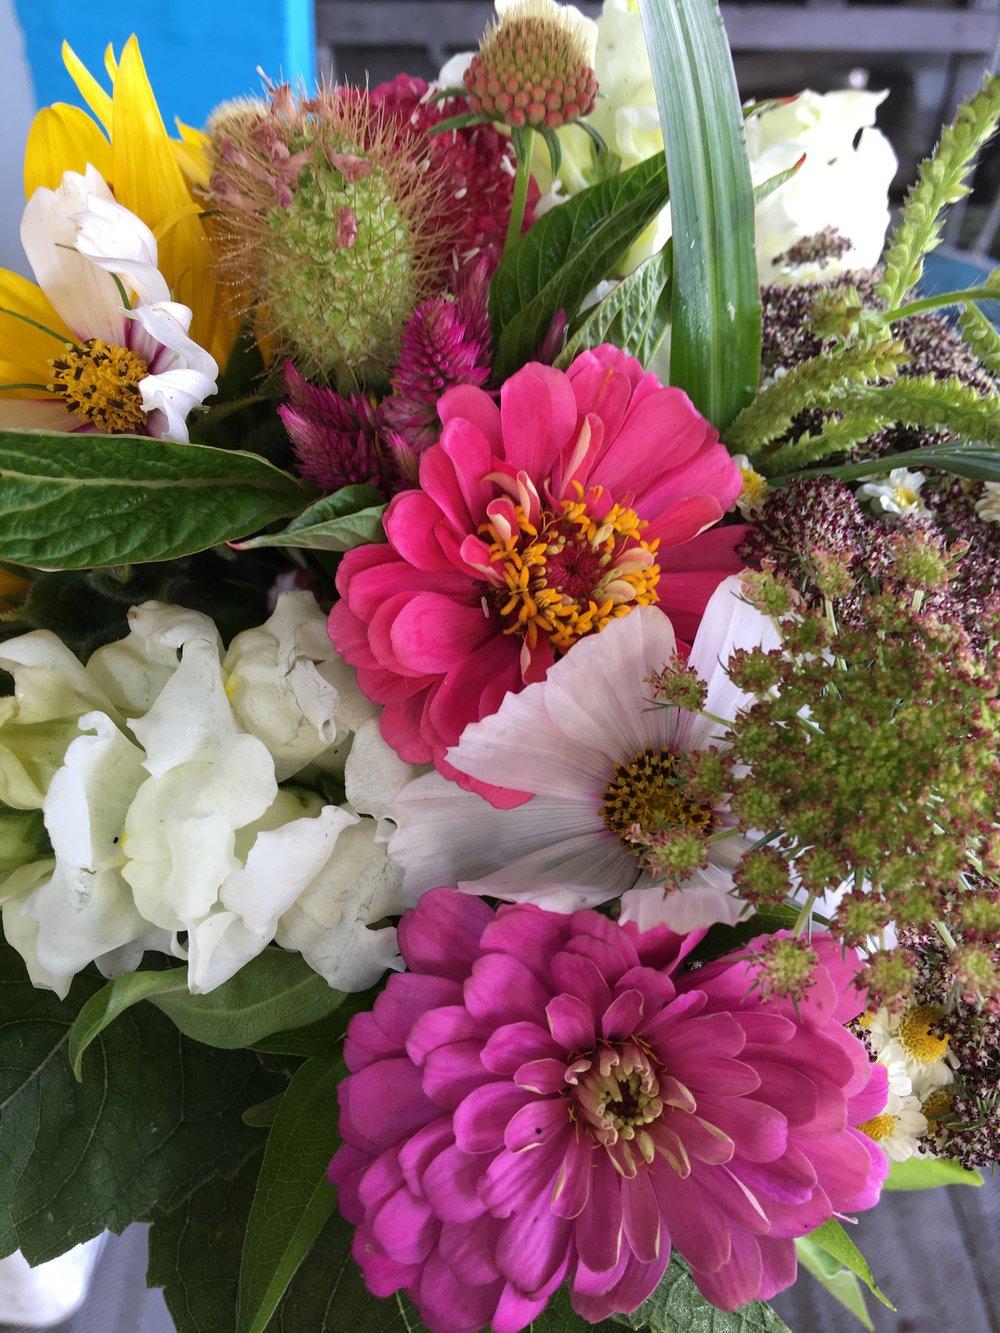 Sat flower CSA Photo july 15 2017.jpg